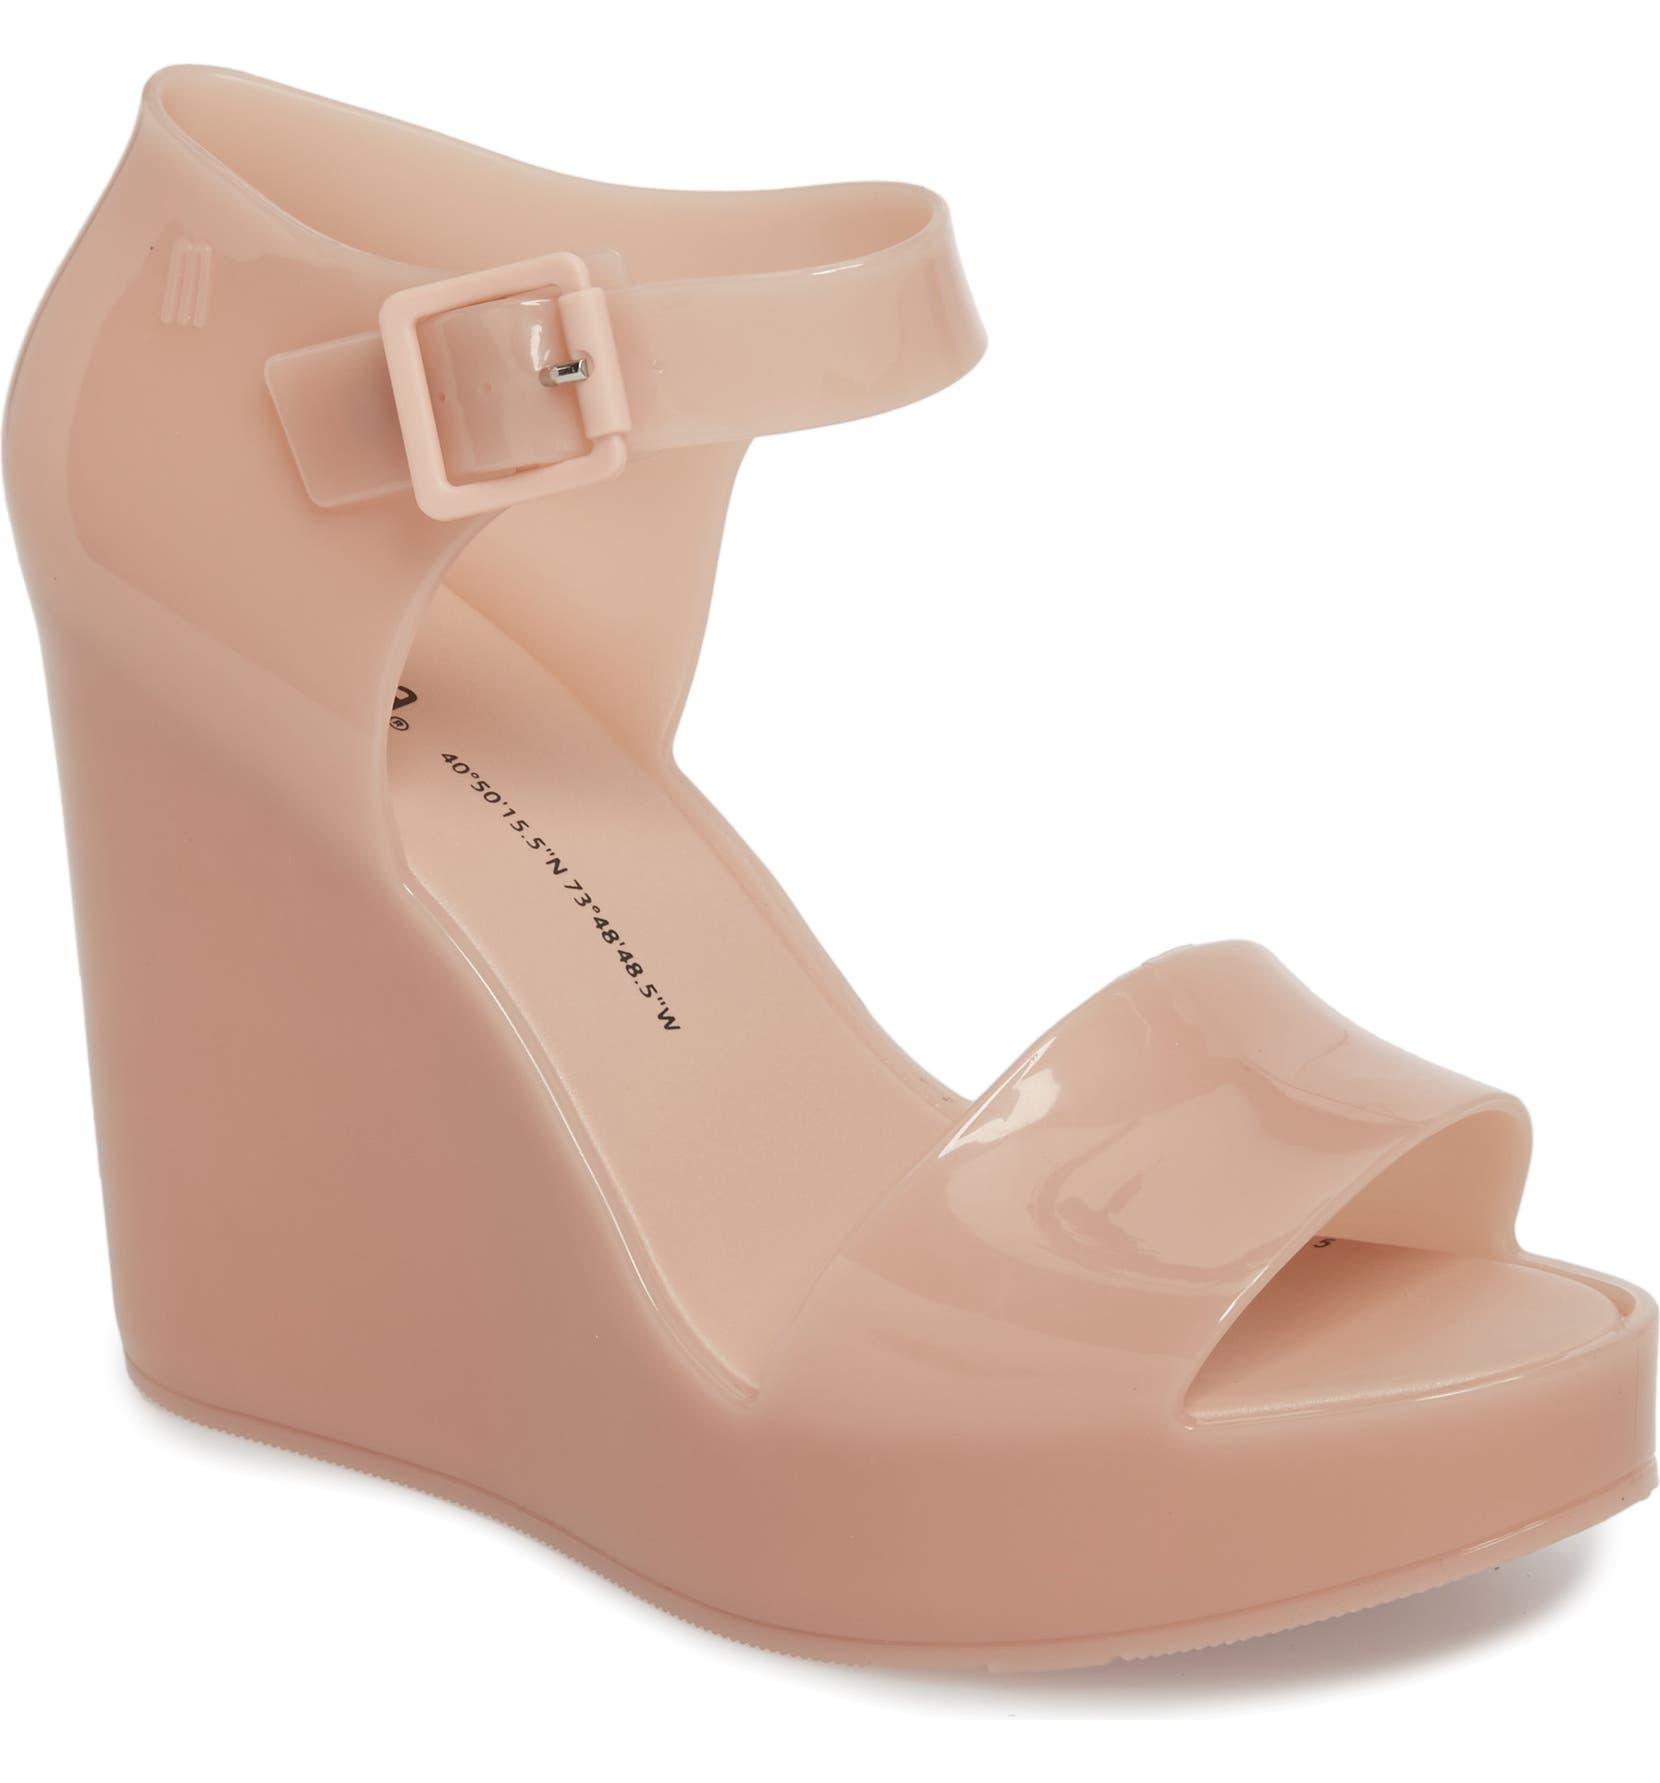 Sandal Mar Wedge Platform Platform Melissa Melissa Mar NXnPk0wO8Z